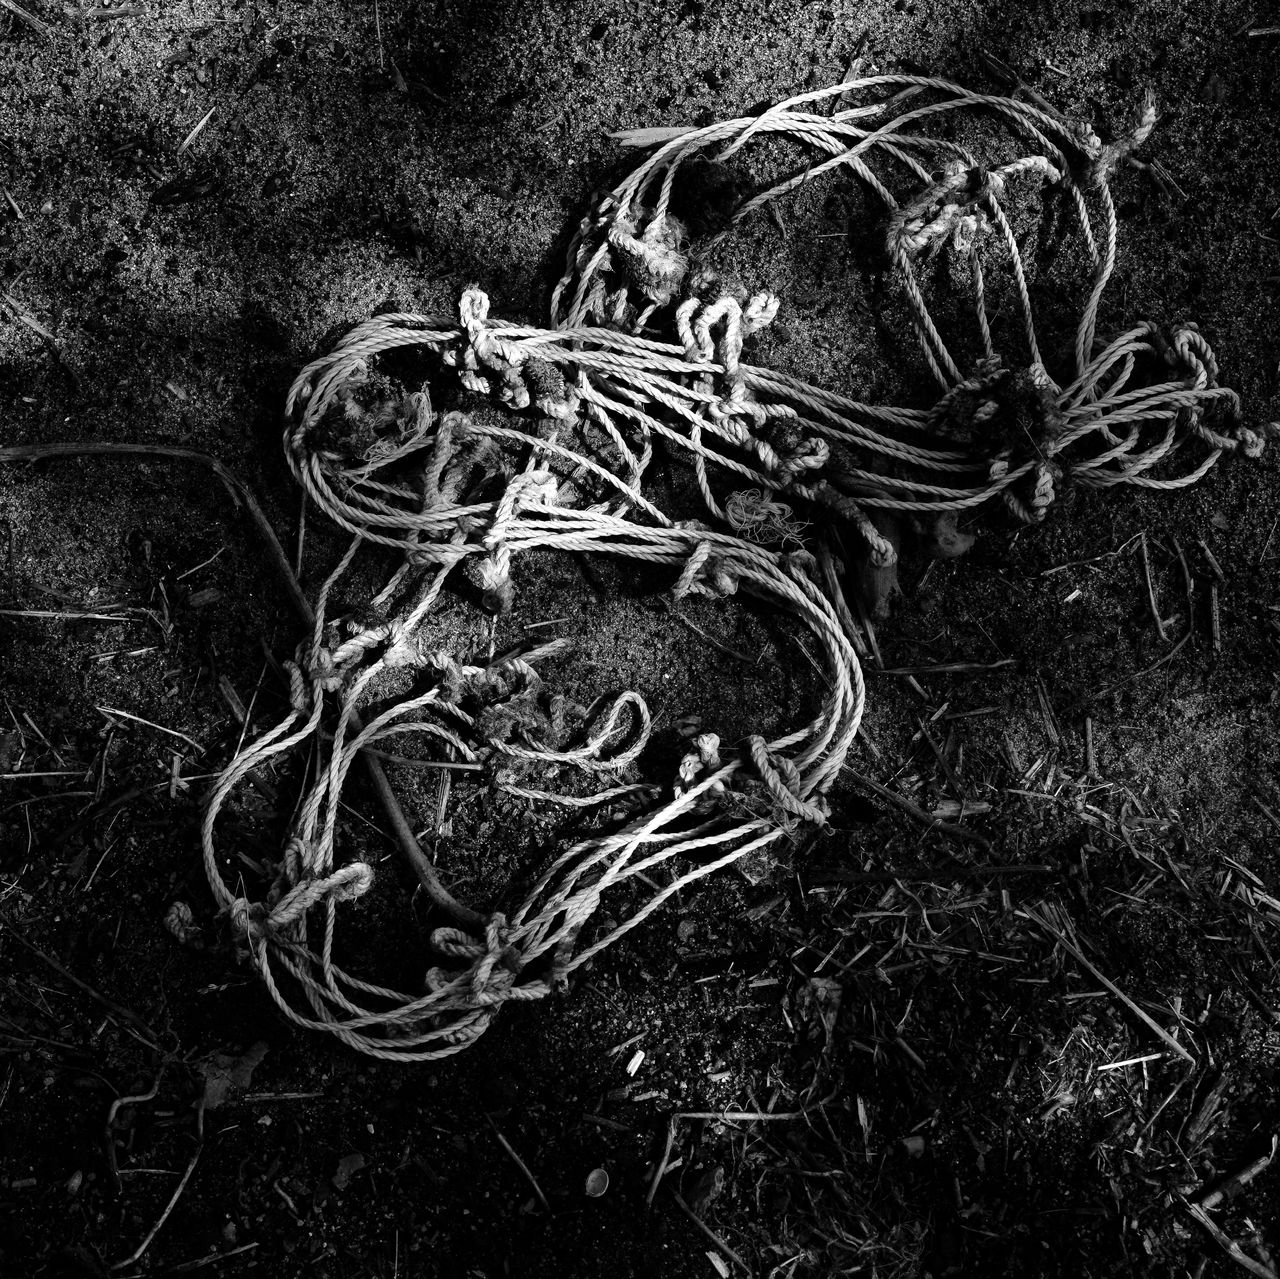 ArtPhoto cordes n & b